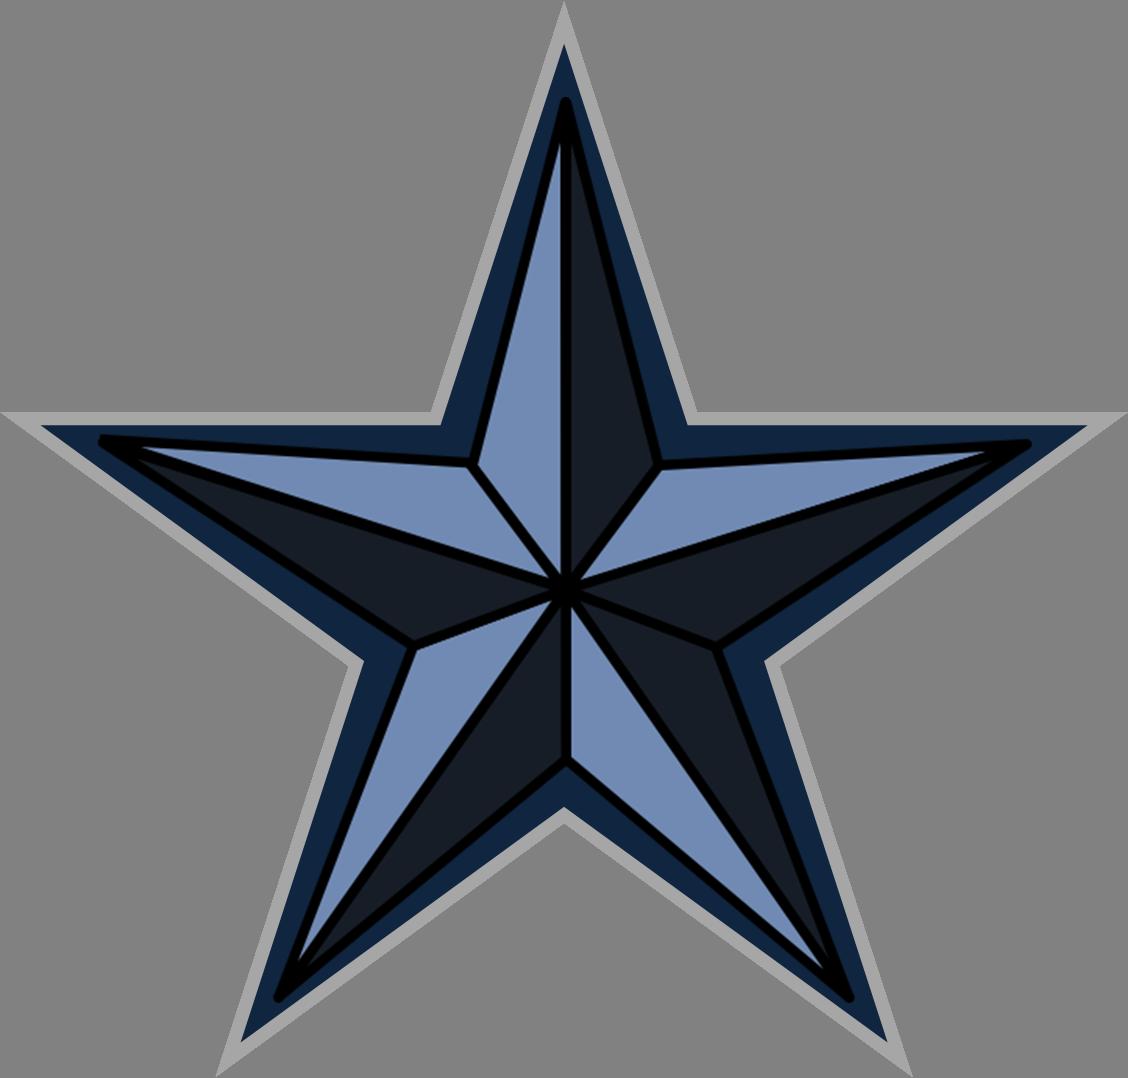 1128x1078 Star Clipart Royal Blue